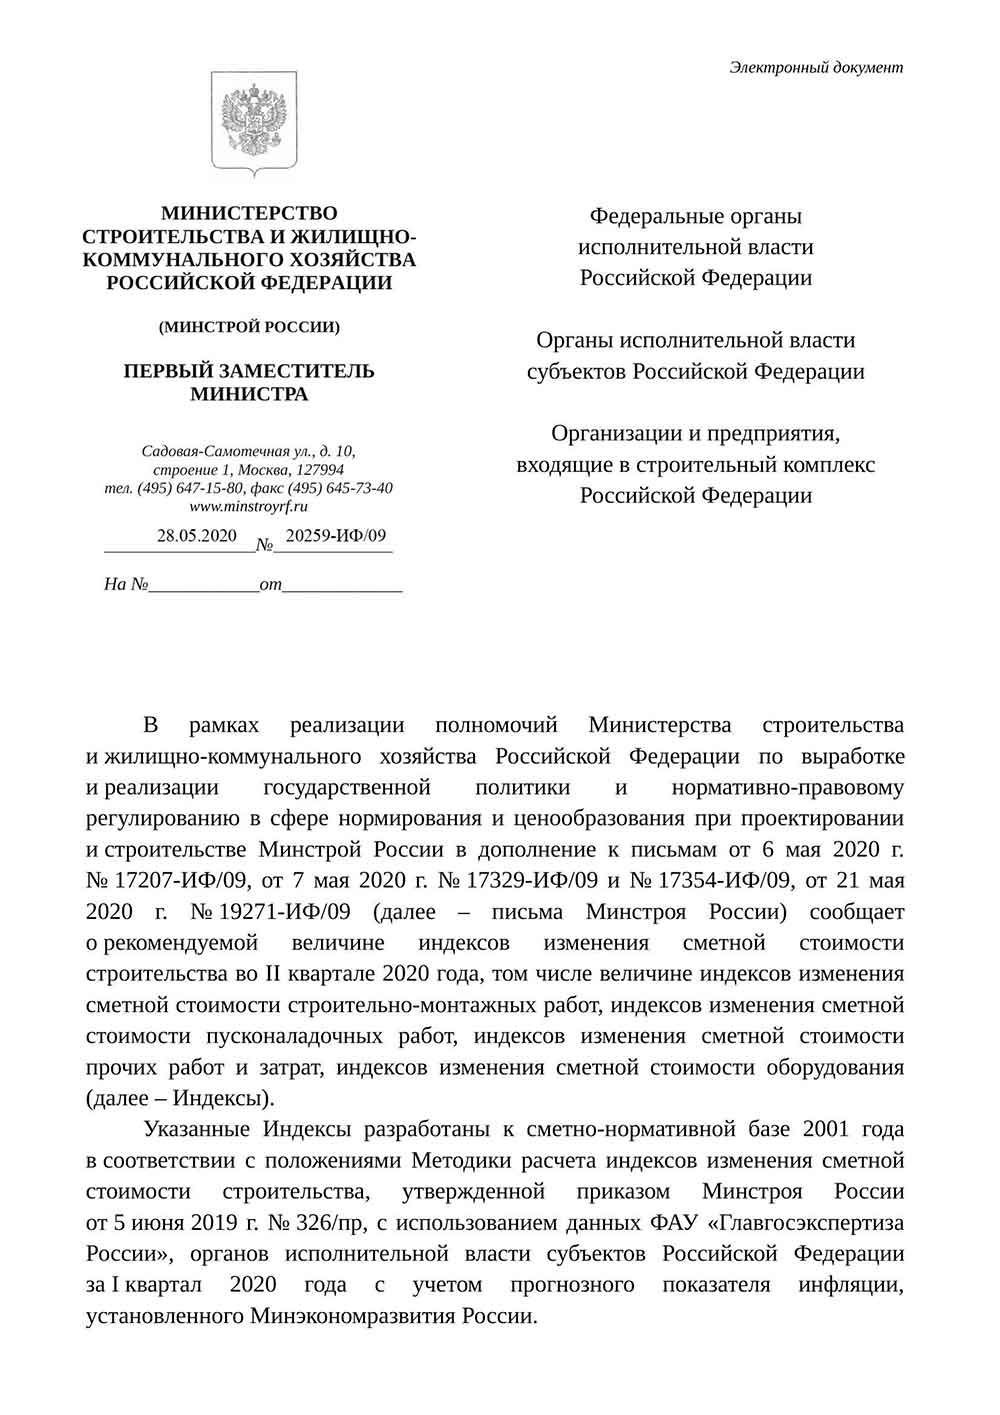 Письмо Минстроя РФ №20259-ИФ/09 от 28.05.2020 г.